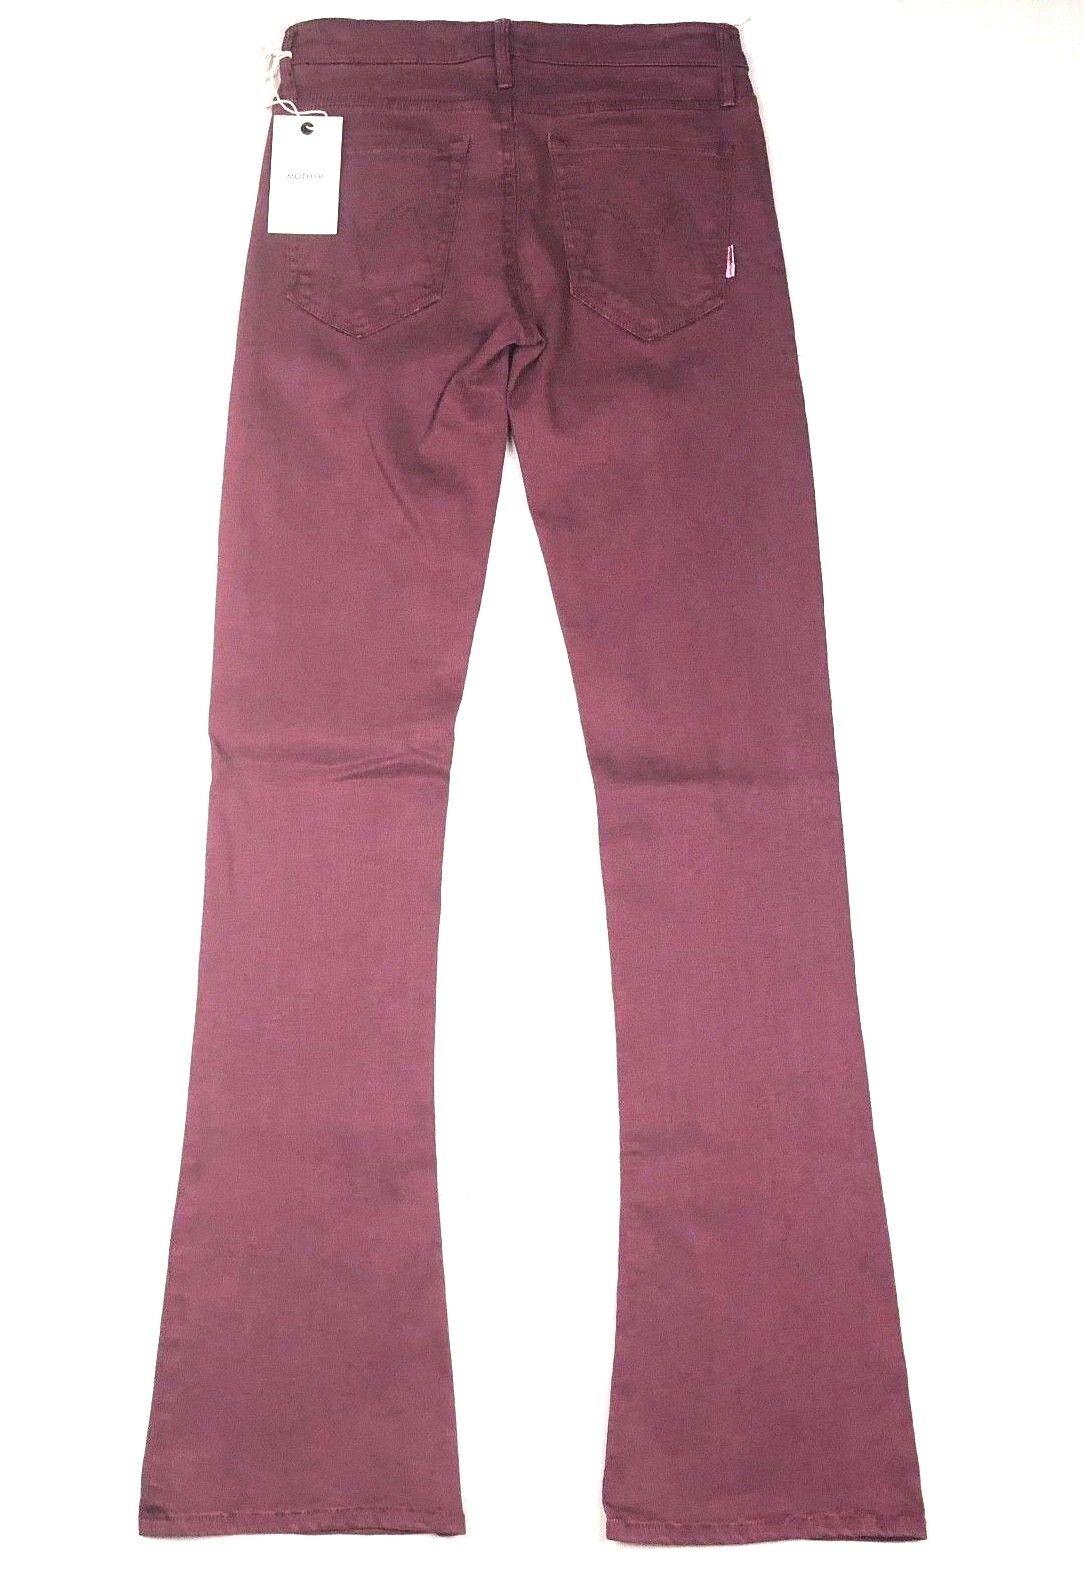 MOTHER Denim The RUNAWAY Pop RSP Raspberry Slim Flare Bootcut Women Jean Pants